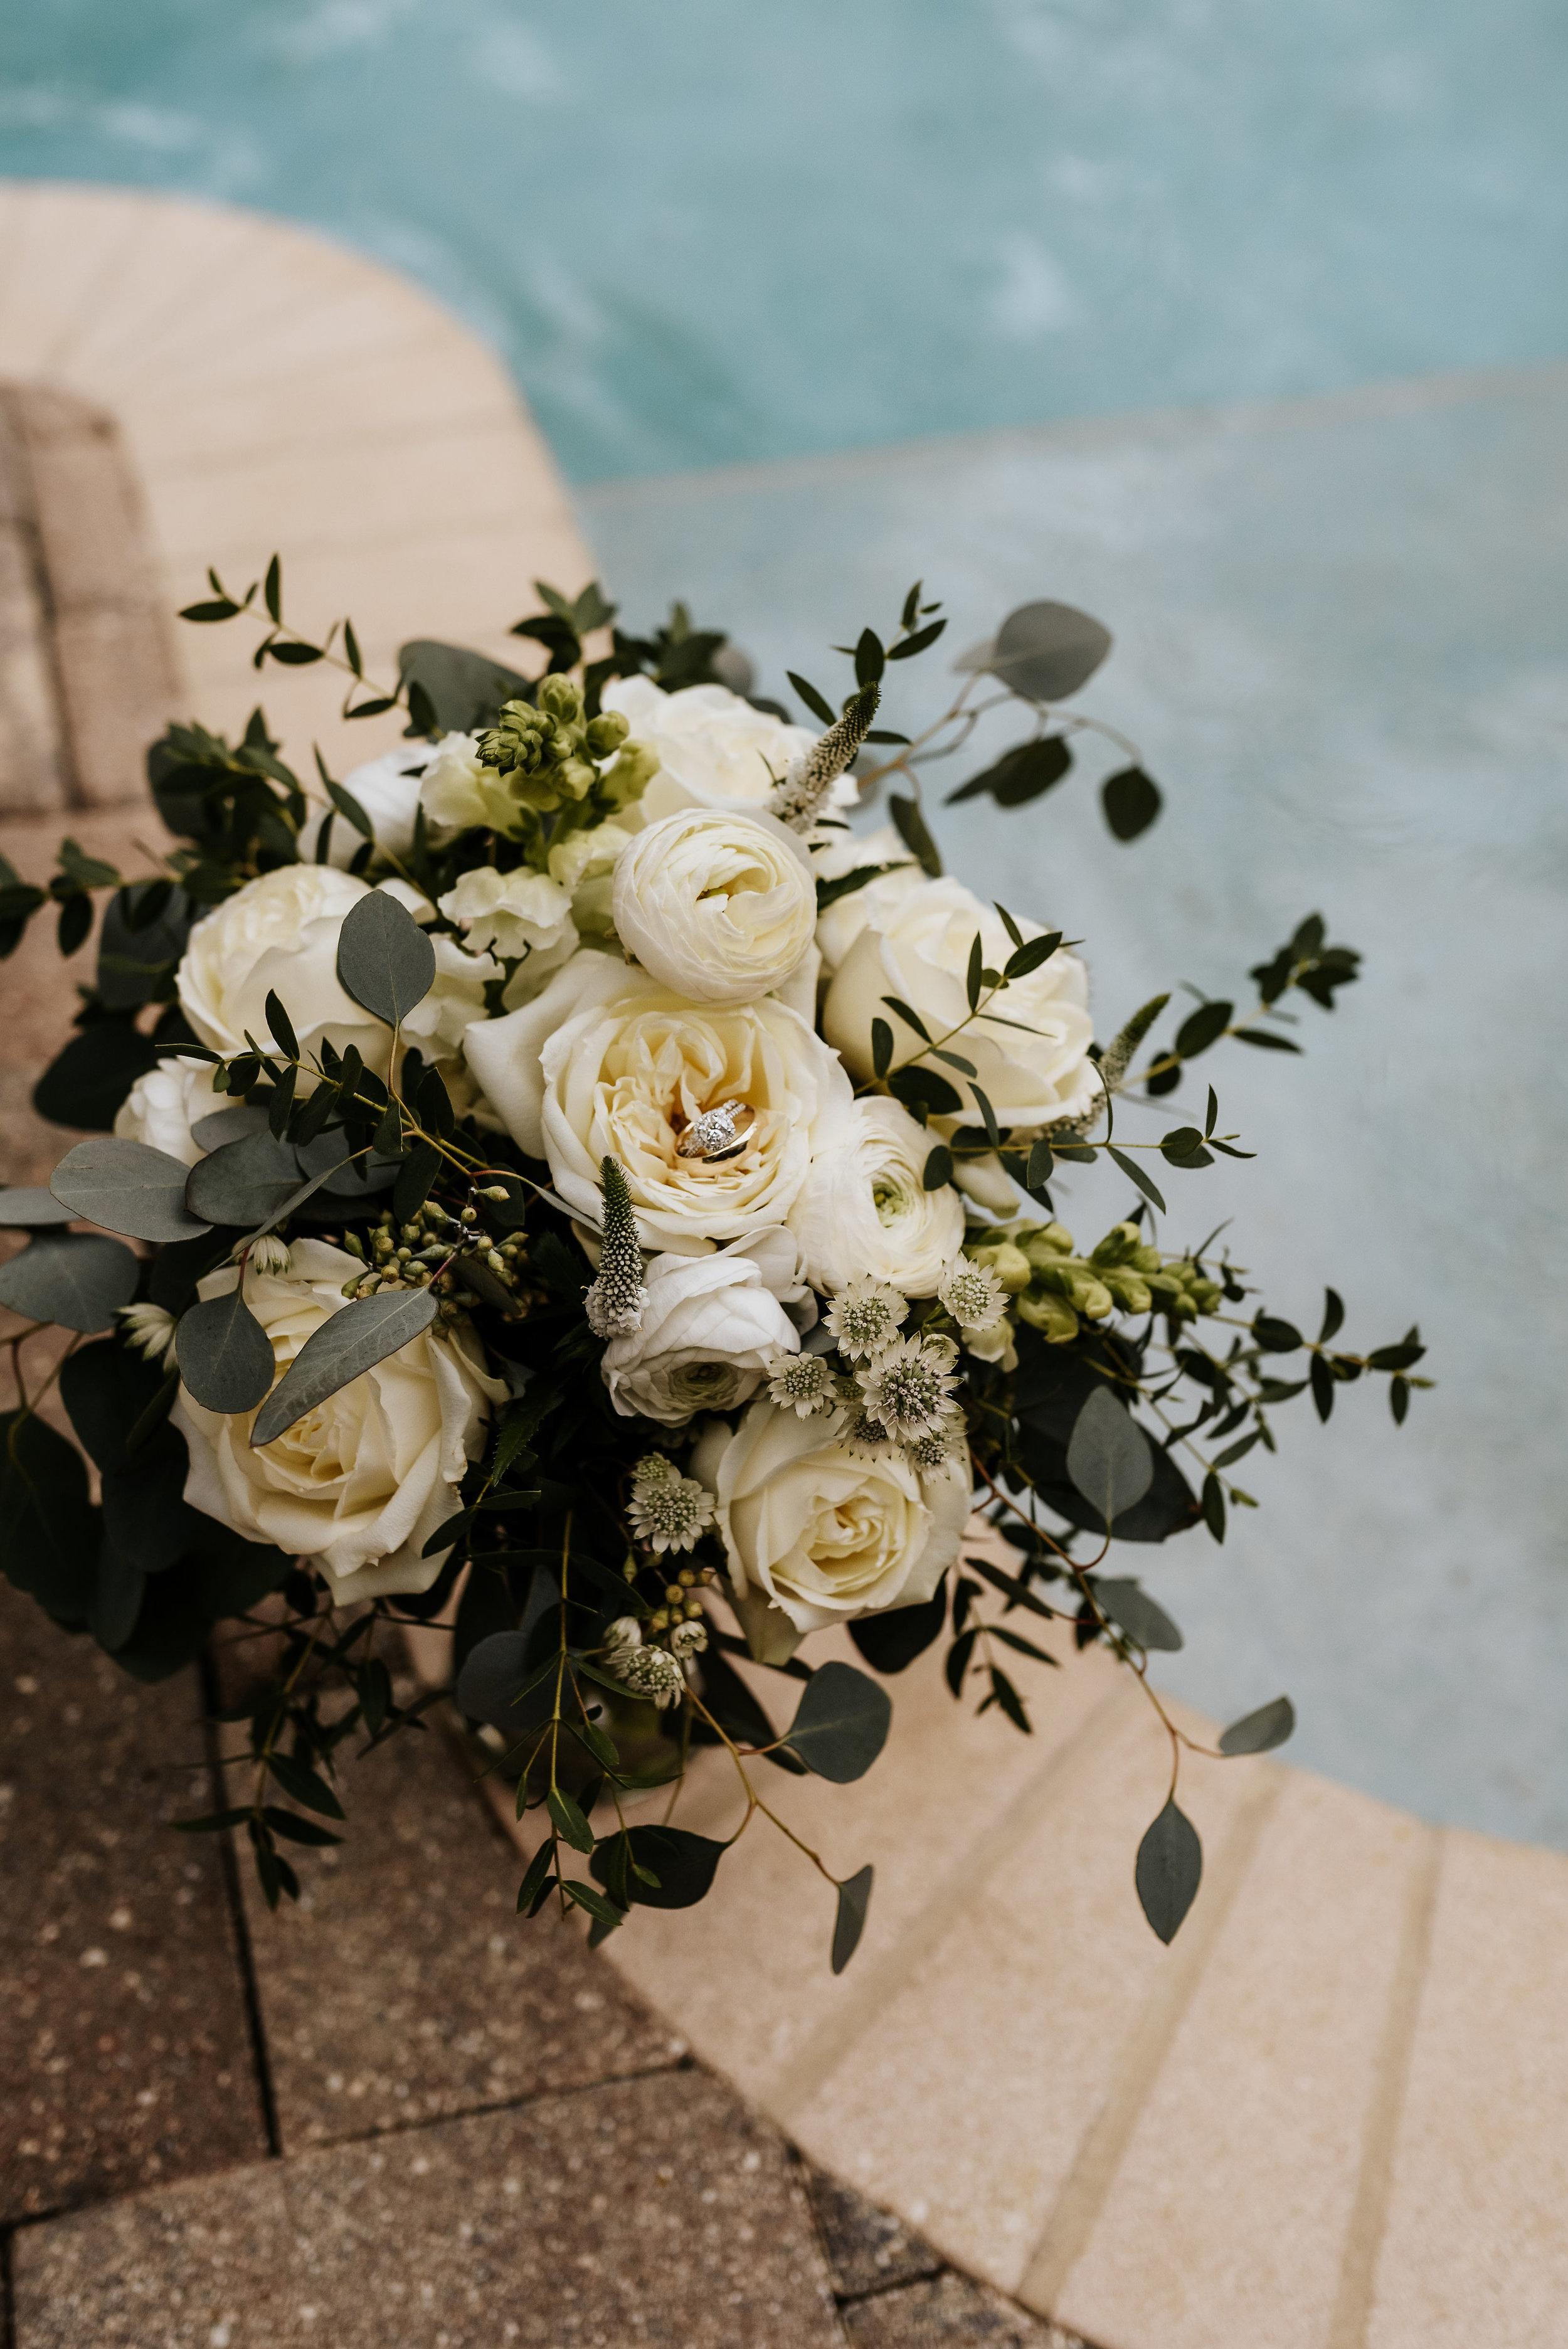 Mikenzi_Brad_Wedding_The_Delamater_House_New_Smyrna_Beach_Florida_Photography_by_V_9689.jpg